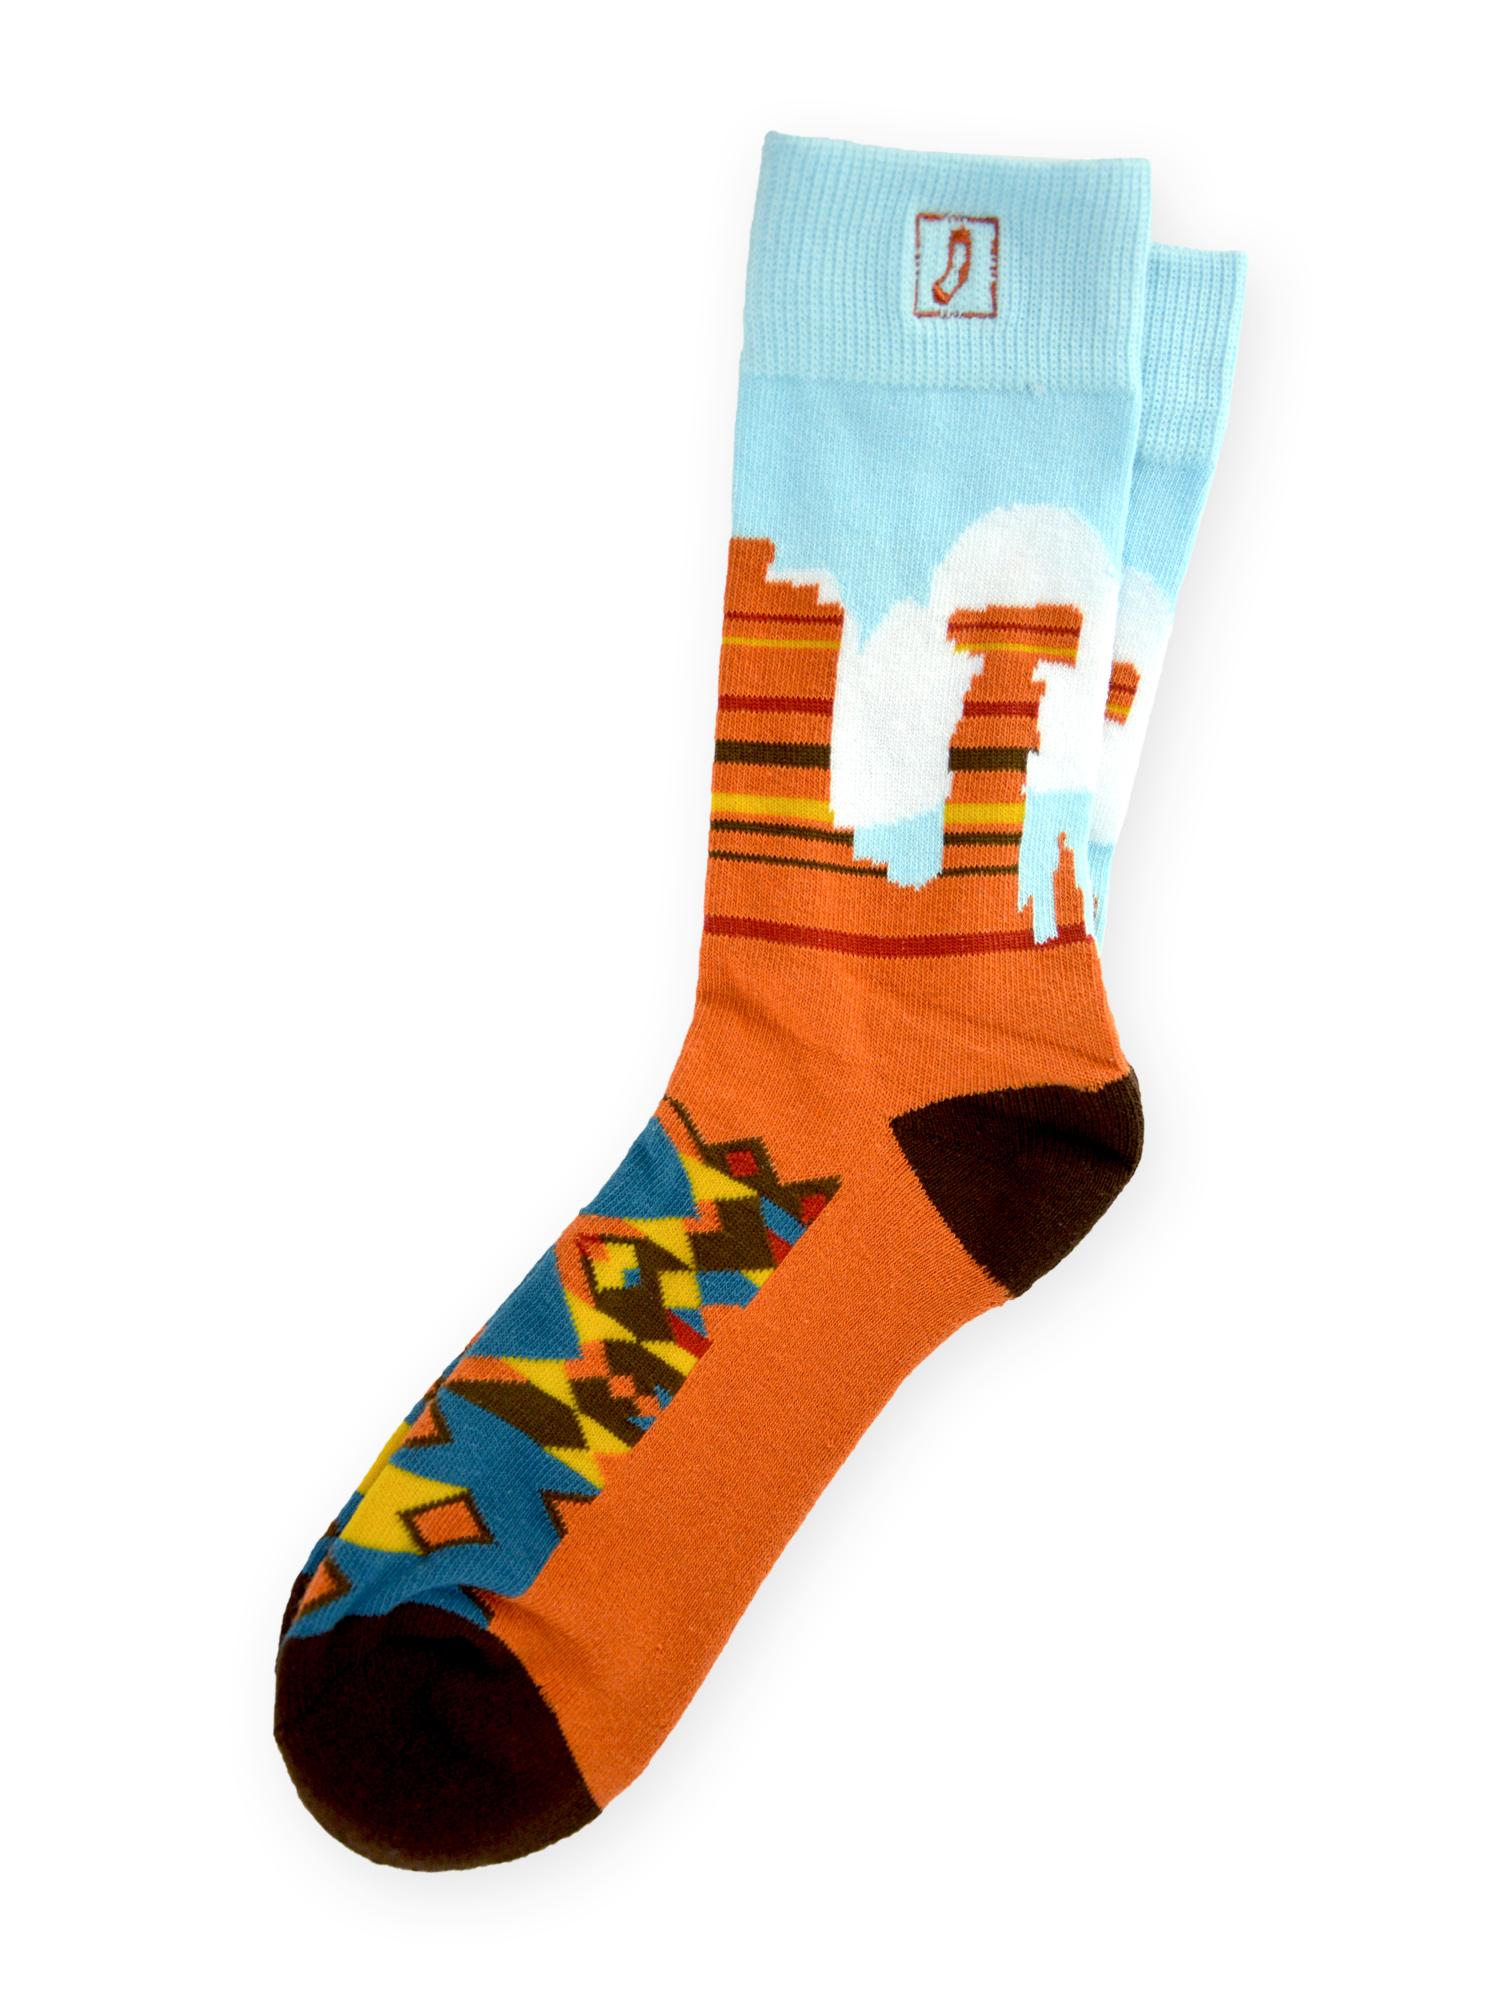 Red Rock Socks